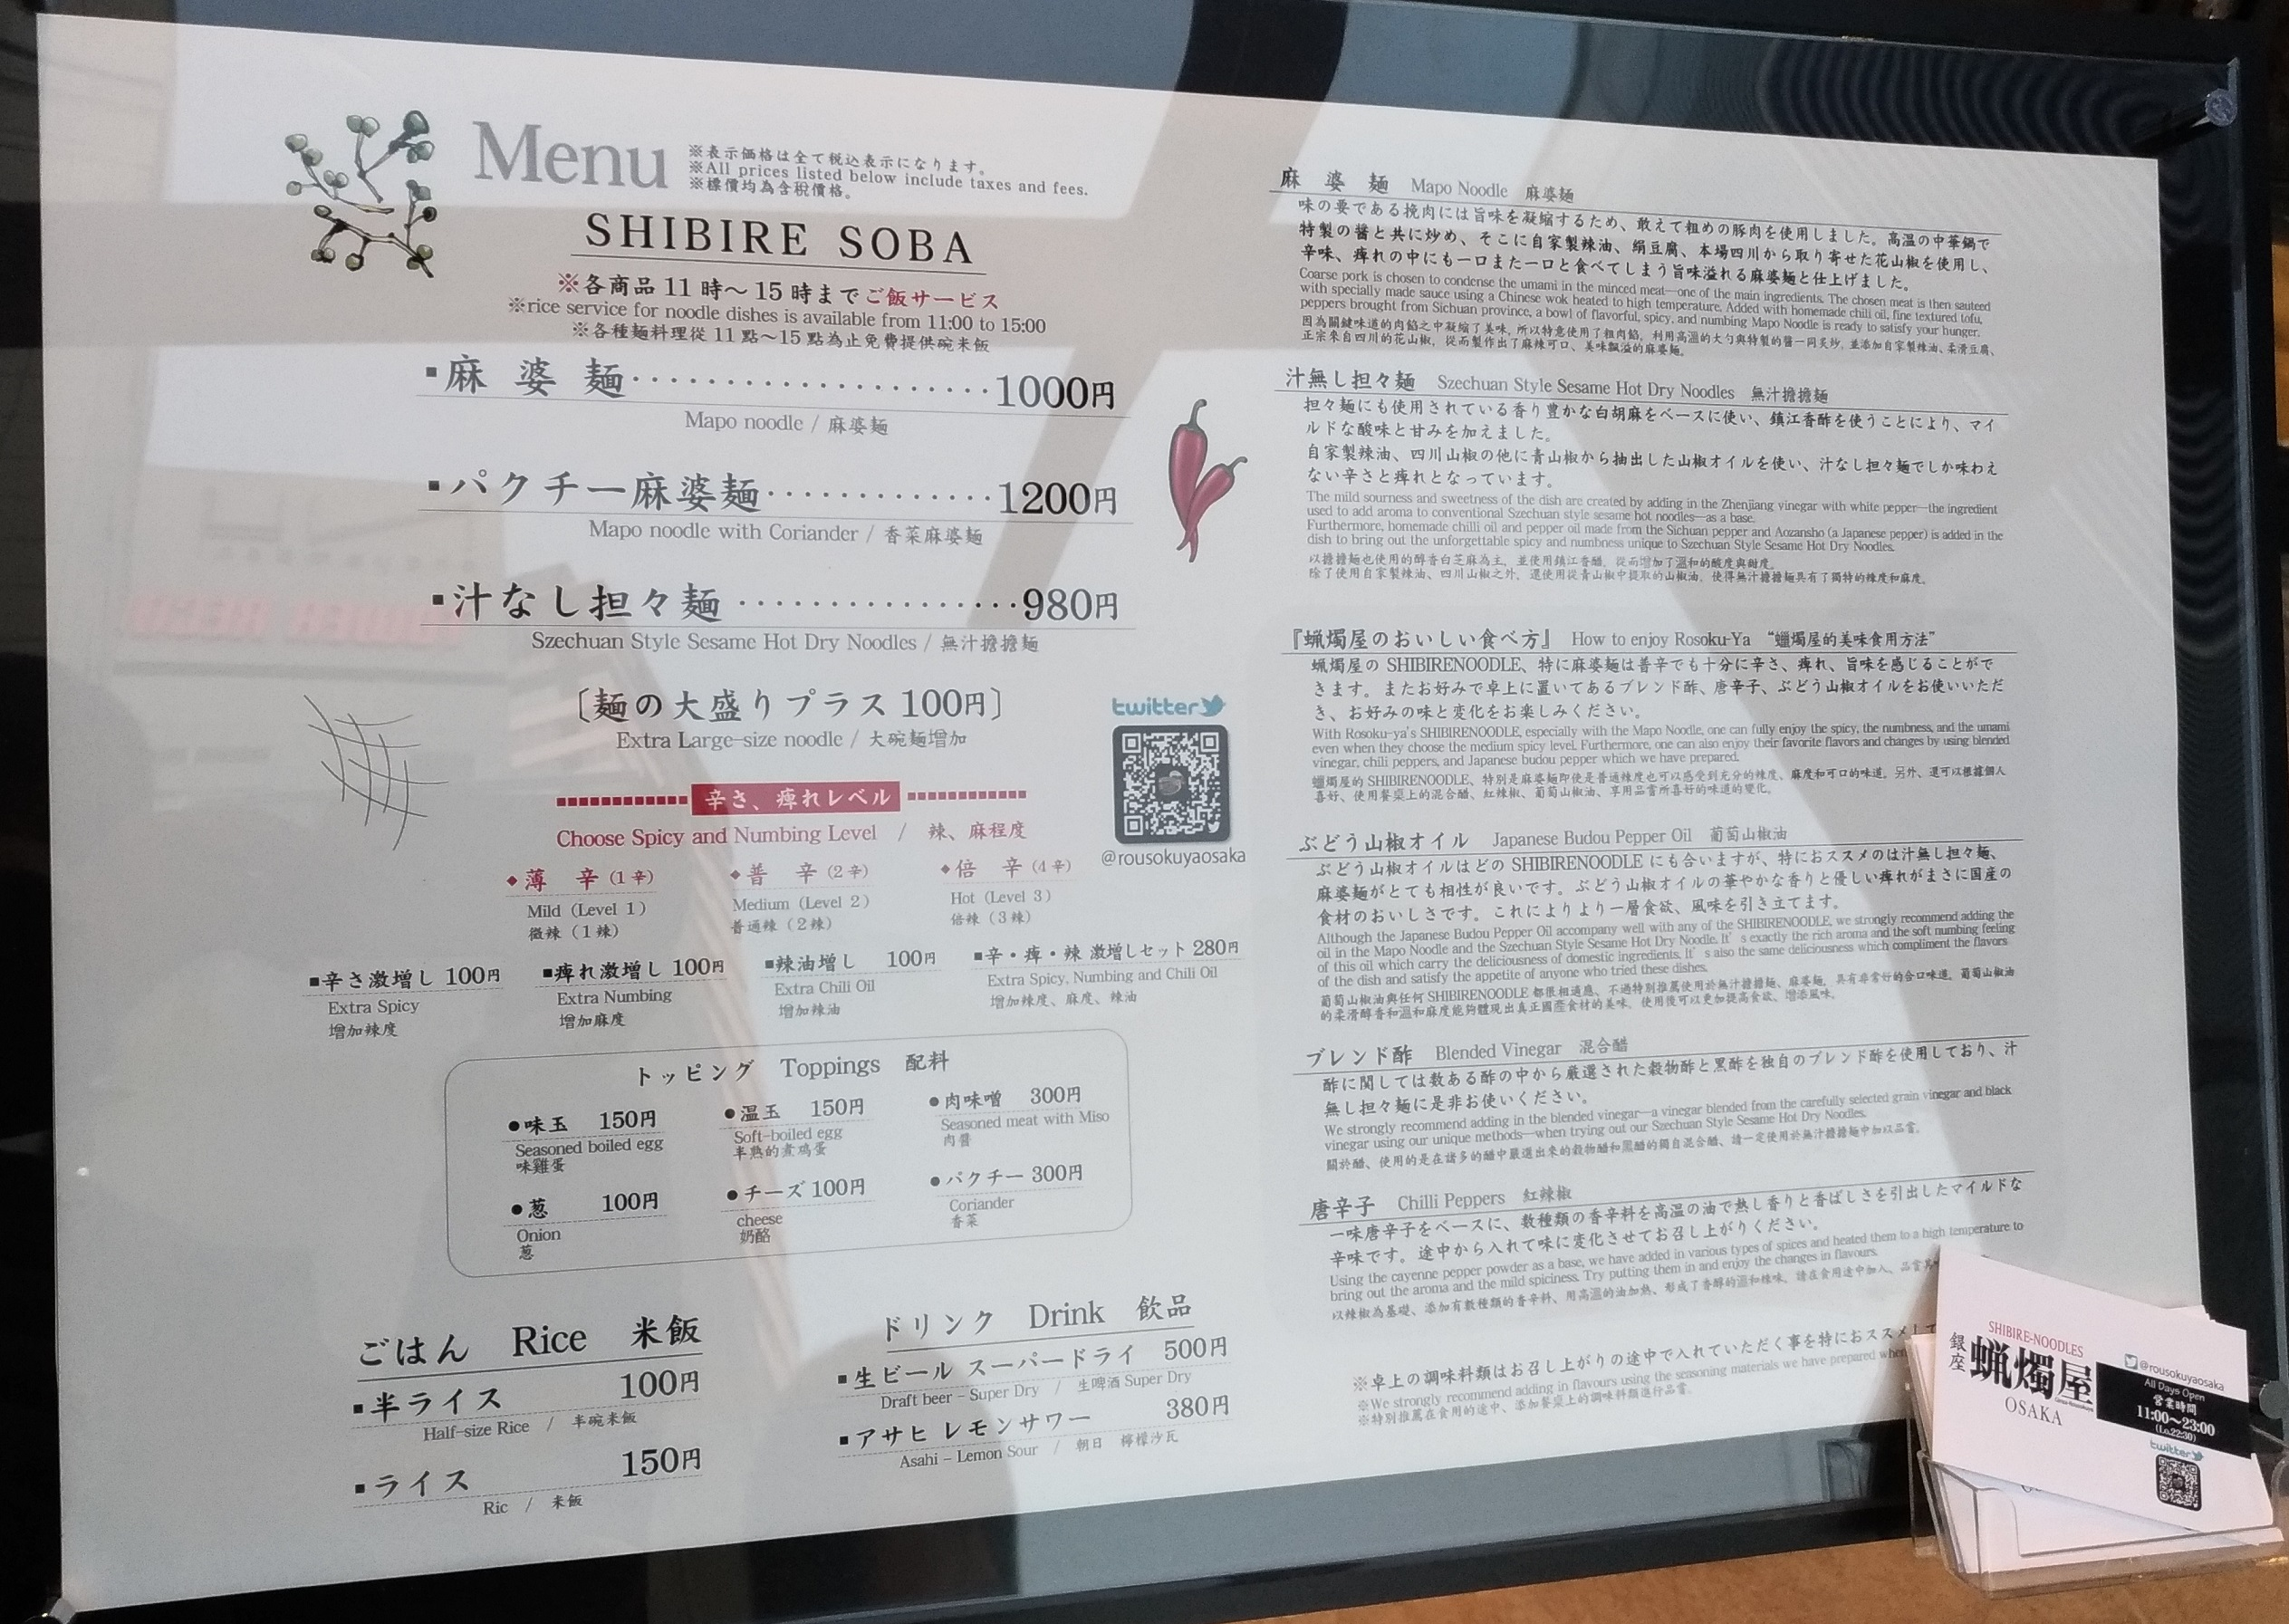 umeda_tyayamachi_aruko_0403_5.jpg